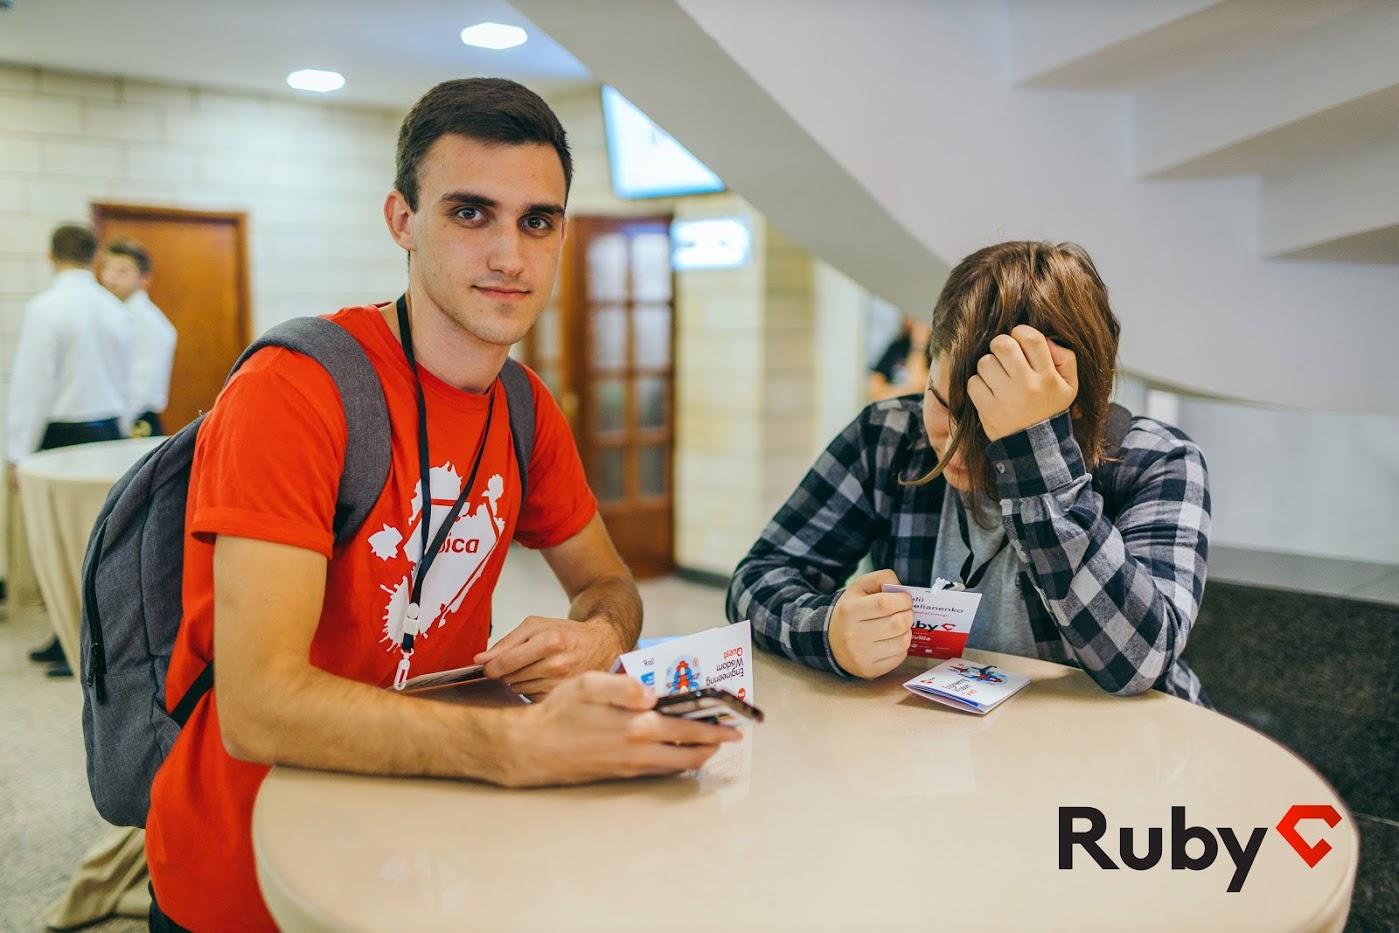 Codica team at RubyC conference